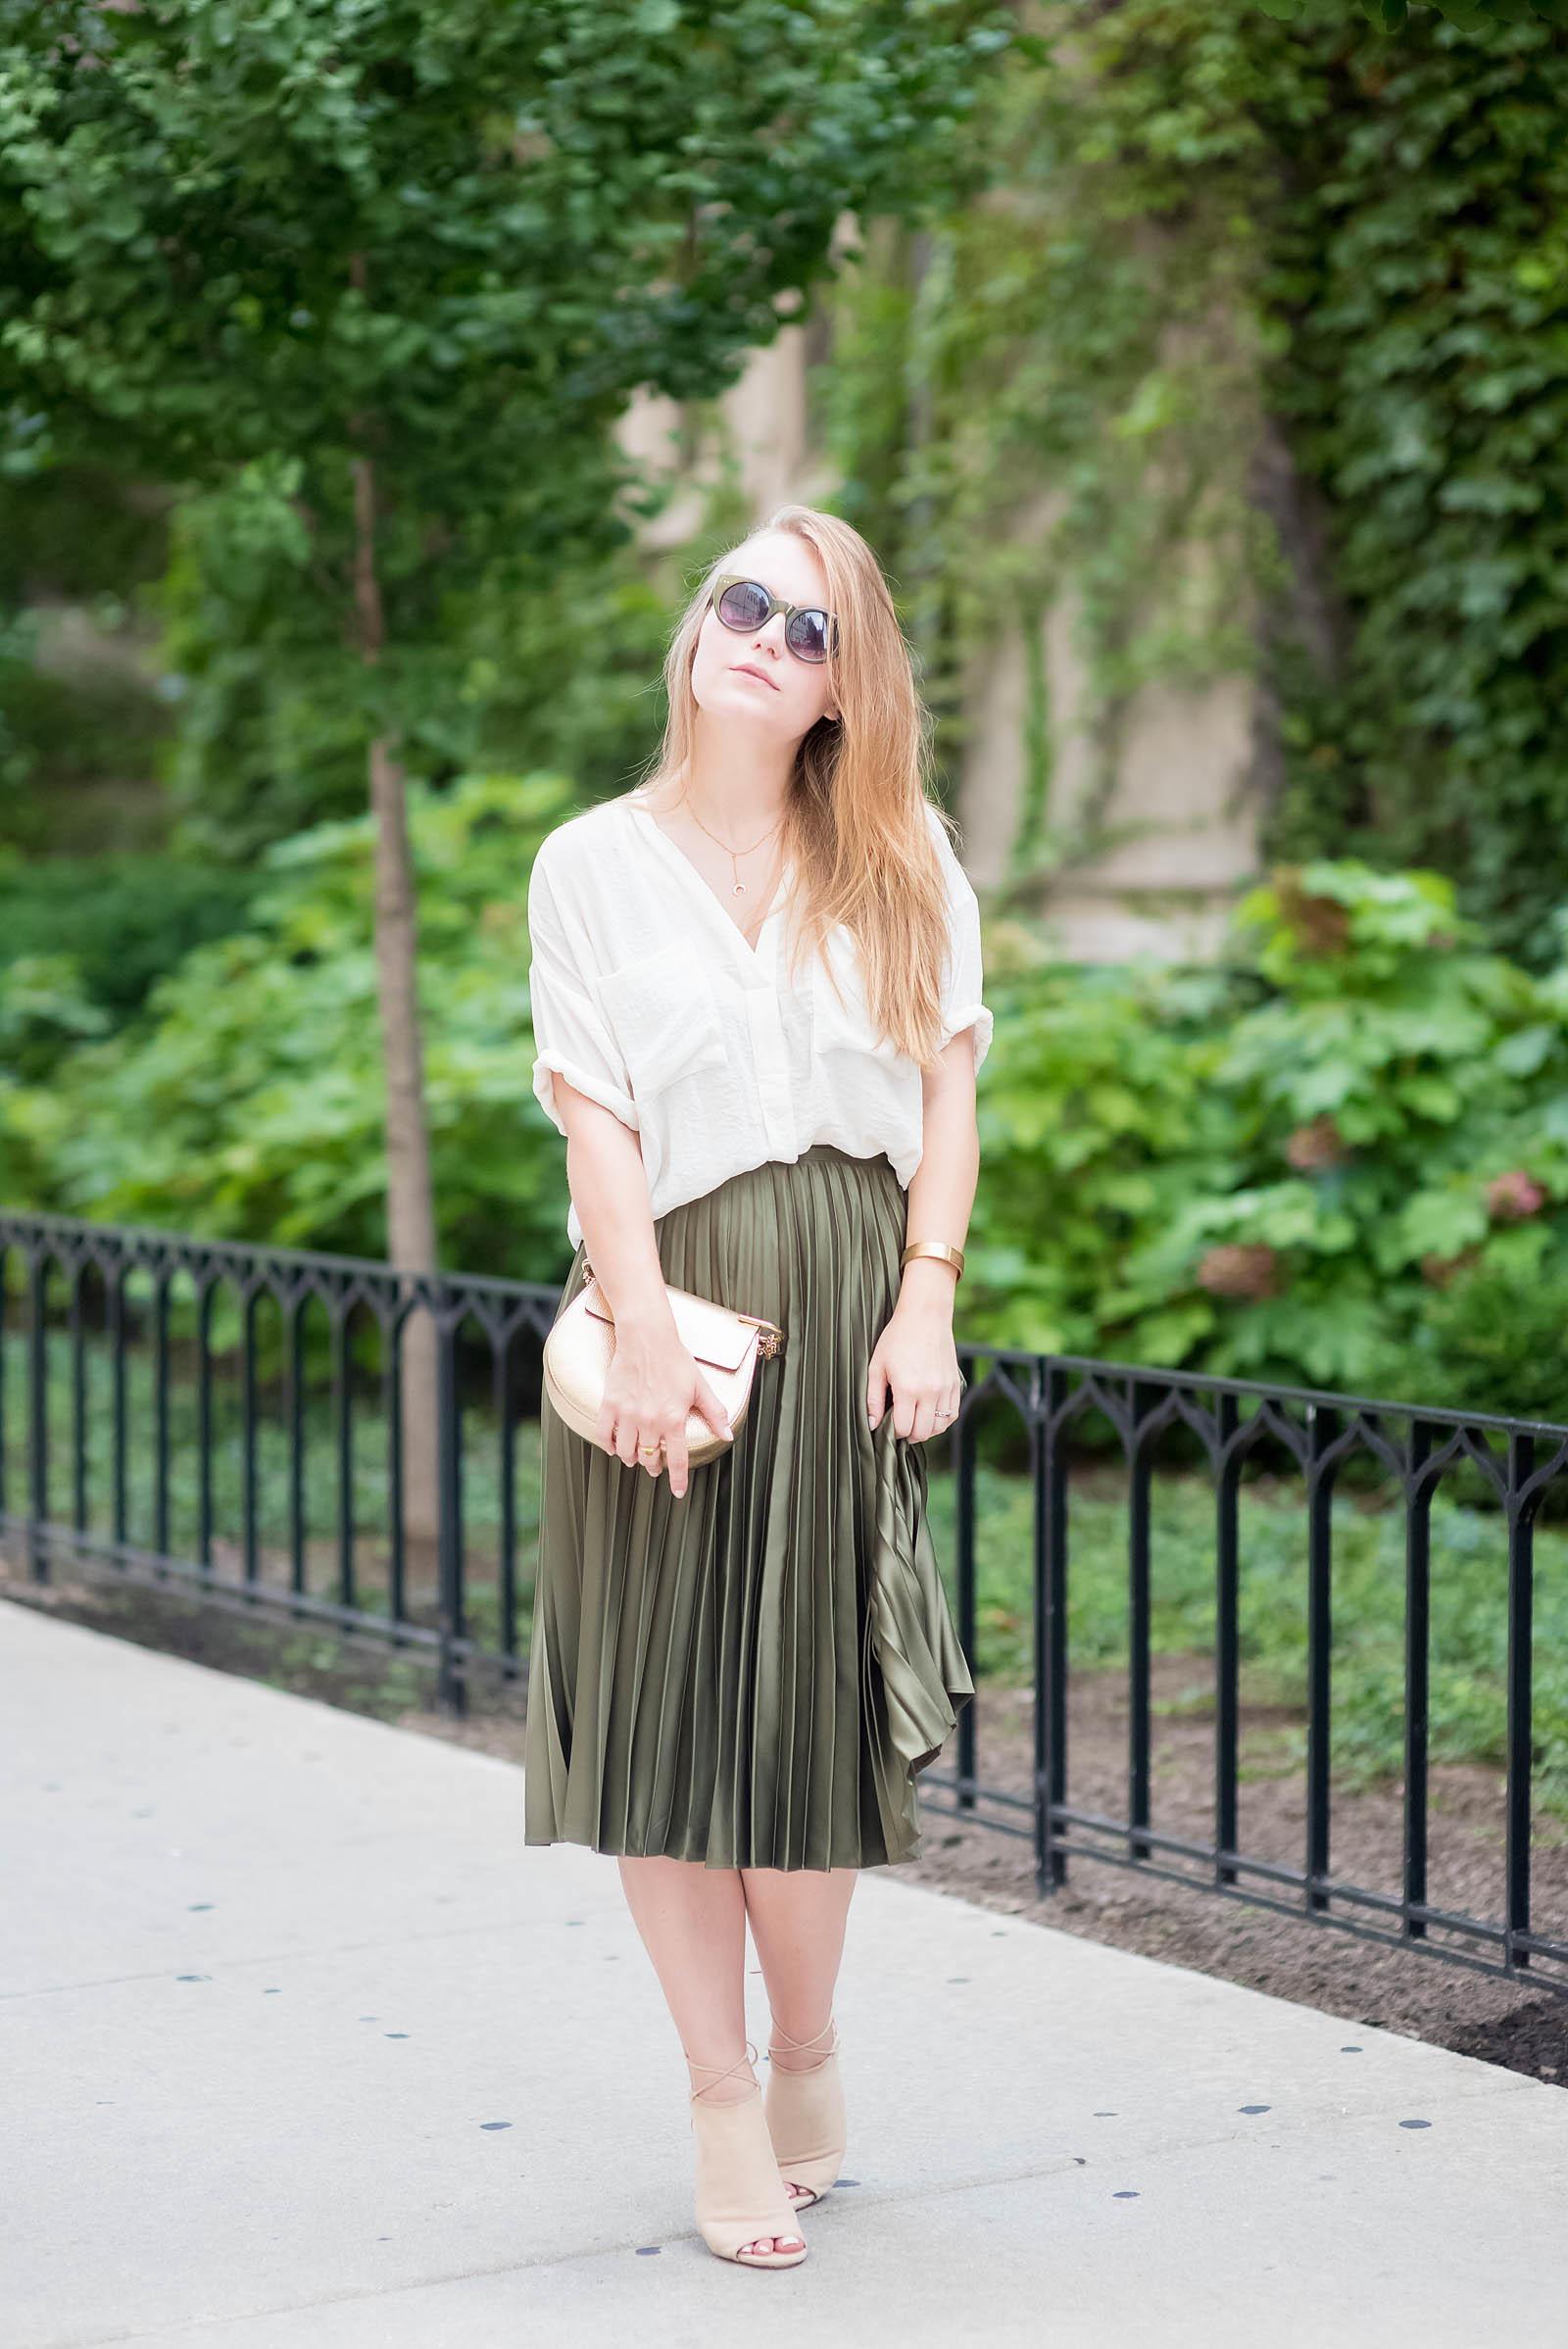 Green Nude Chloé Aquazzura Outfit Inspiration